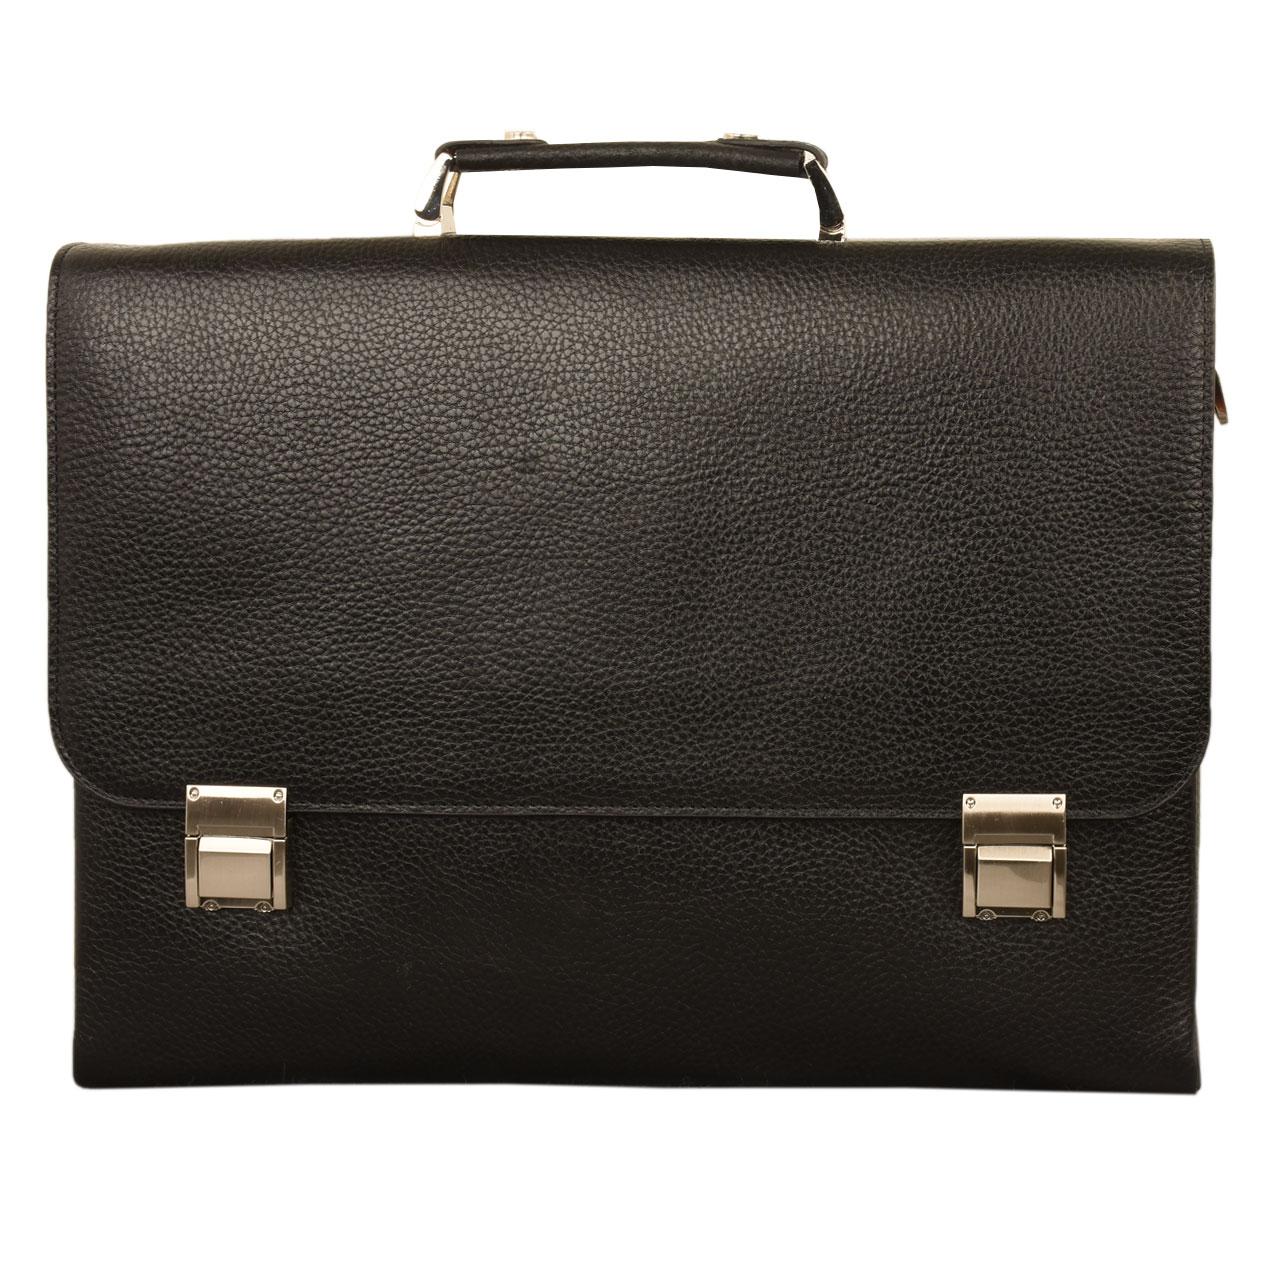 کیف اداری مردانه کهن چرم کد L146